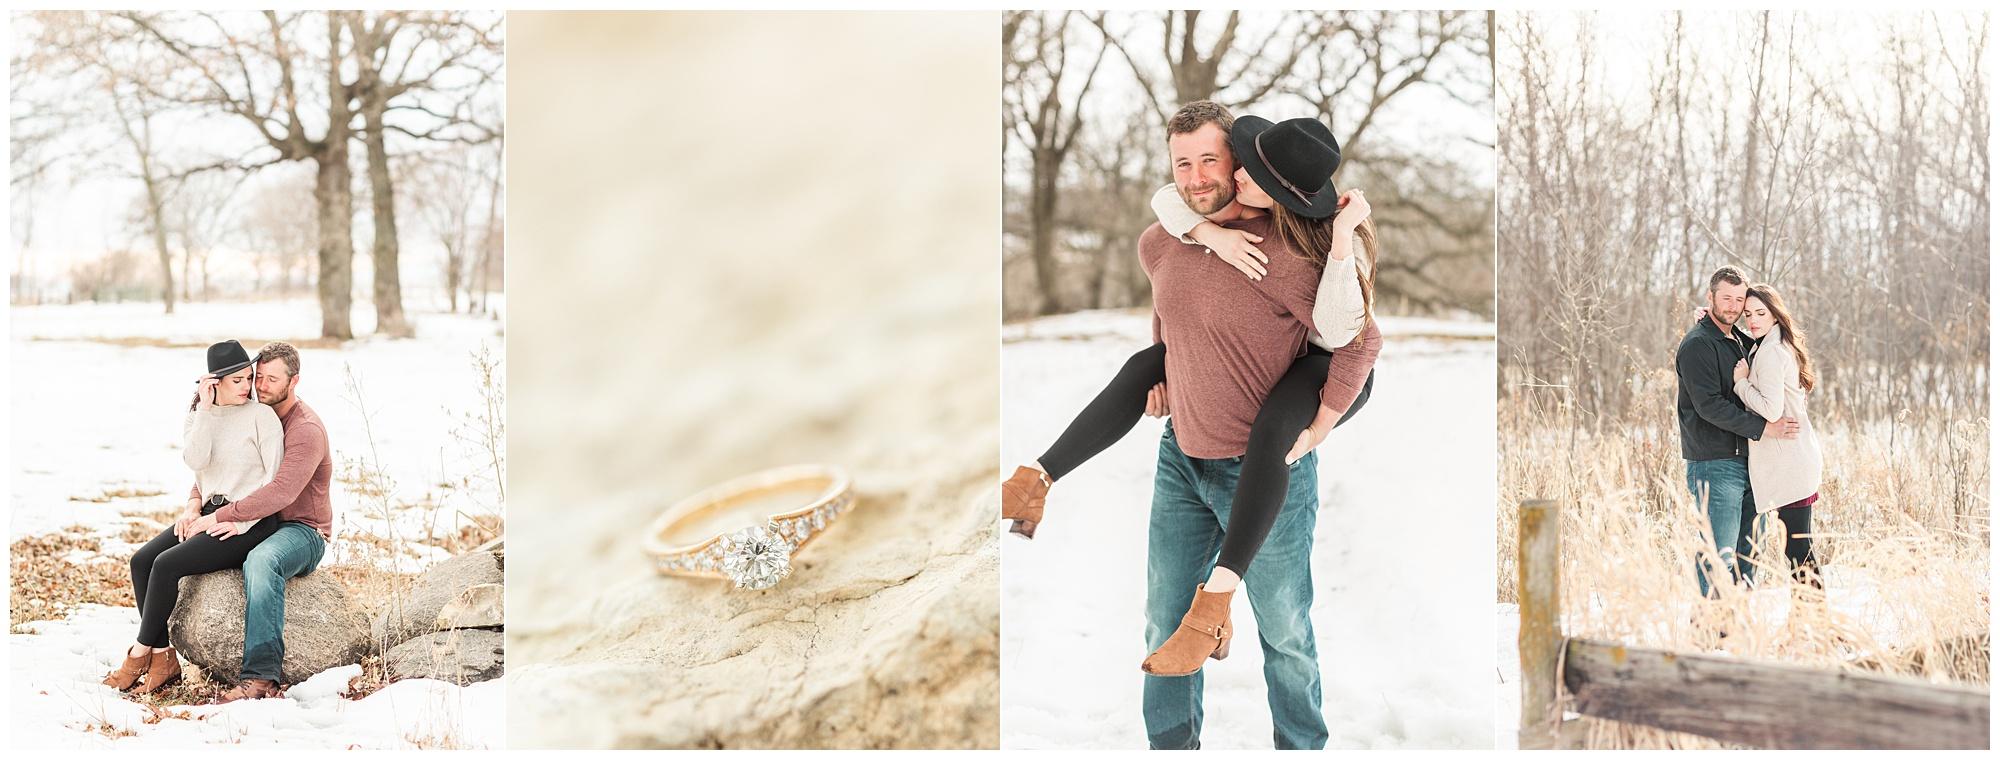 Renee + Cody | Engaged